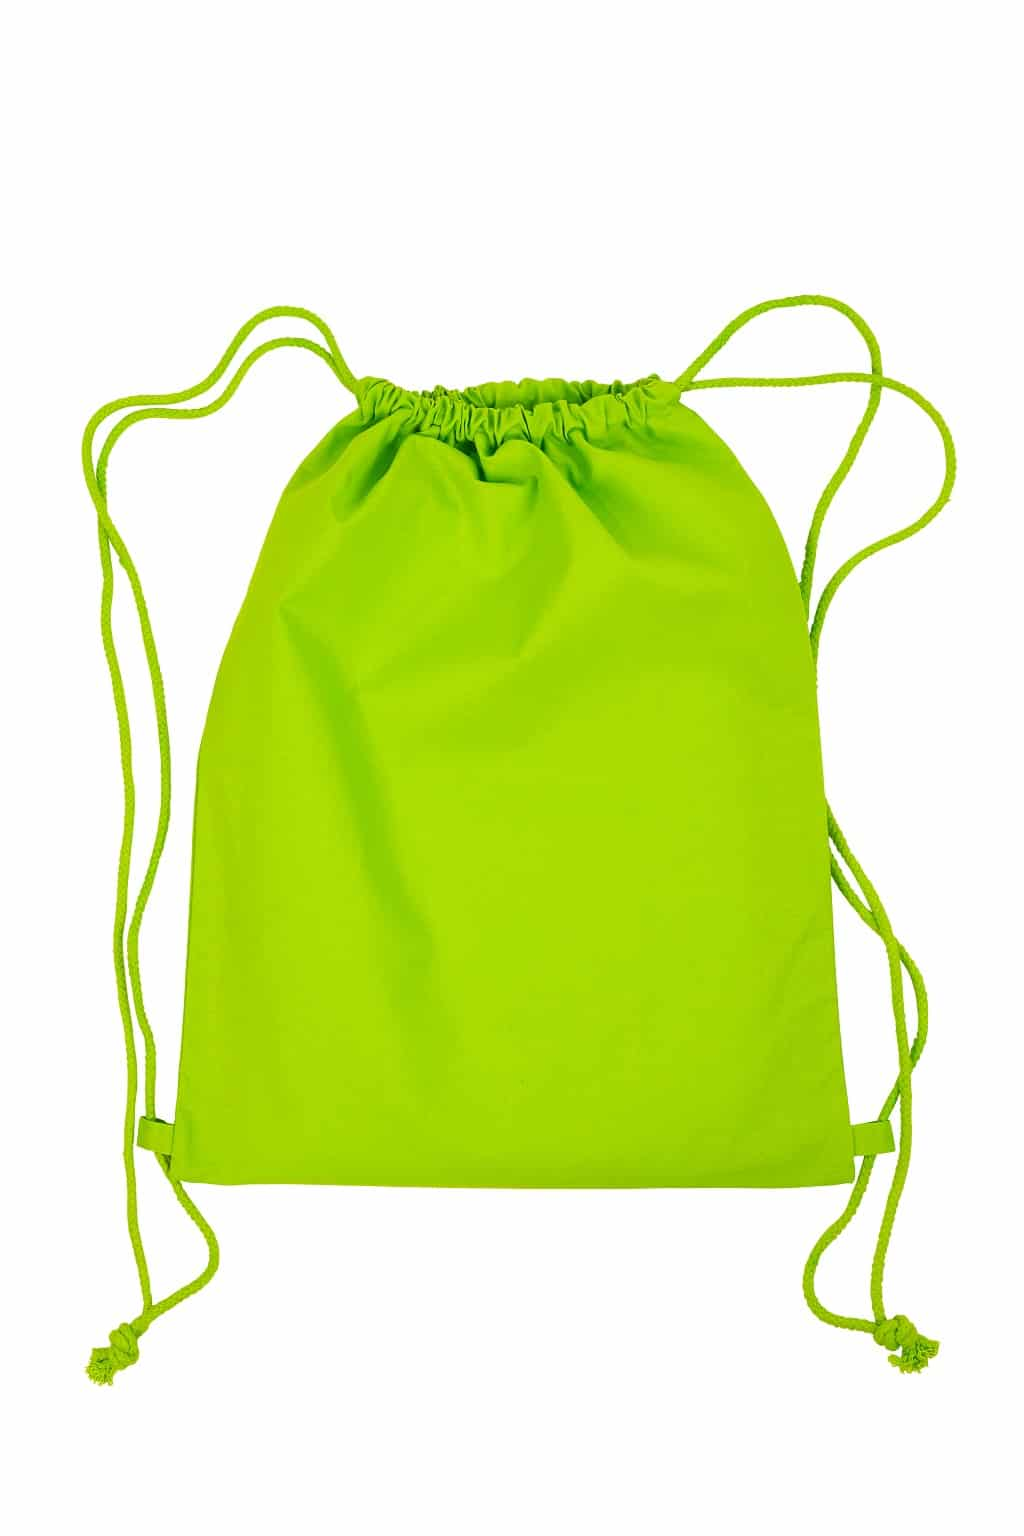 grüner Beutel